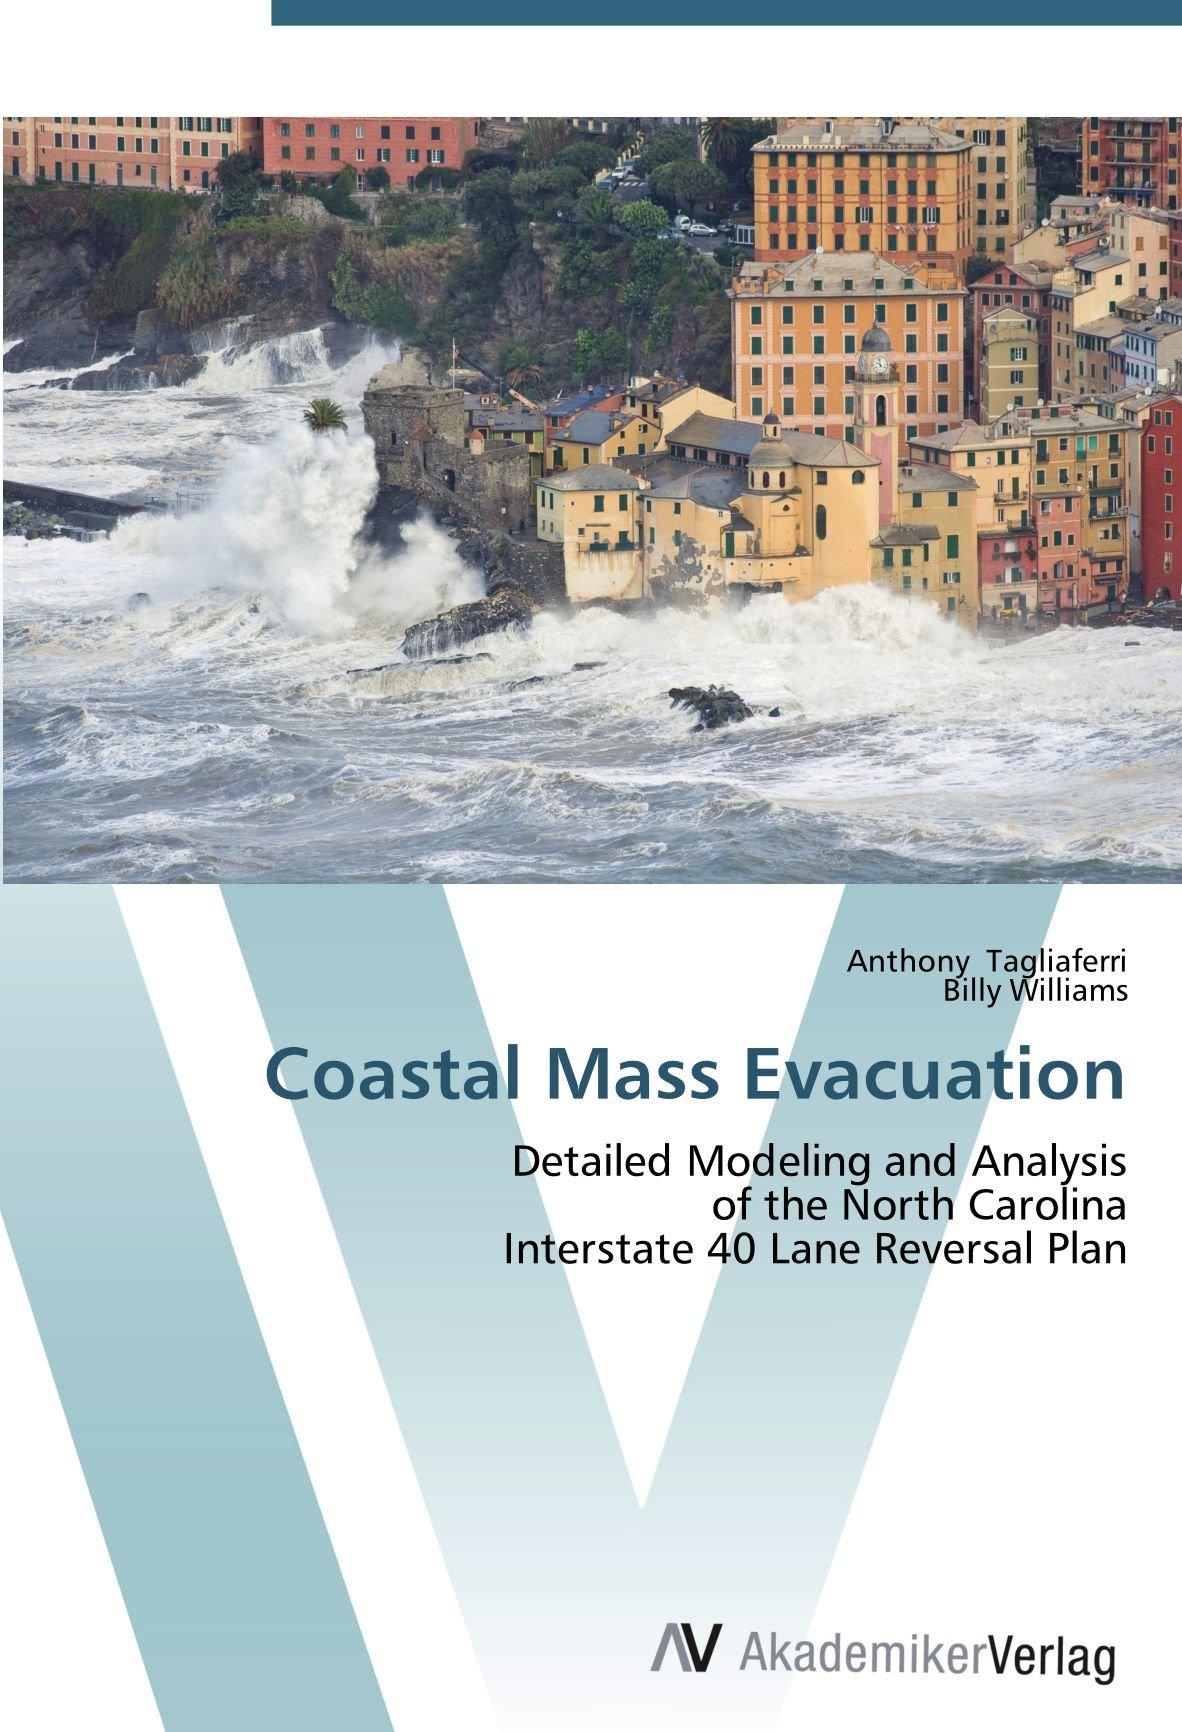 Coastal Mass Evacuation: Detailed Modeling and Analysis of the North Carolina Interstate 40 Lane Reversal Plan ebook